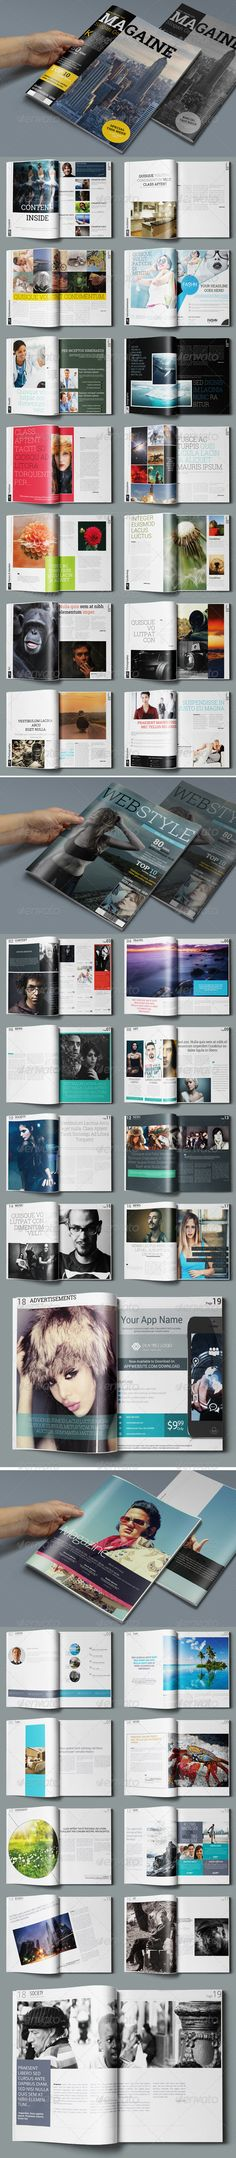 3in1 Magazine Bundle — Photoshop PSD #photoshop magazine #organized • Available here → https://graphicriver.net/item/3in1-magazine-bundle/7813912?ref=pxcr